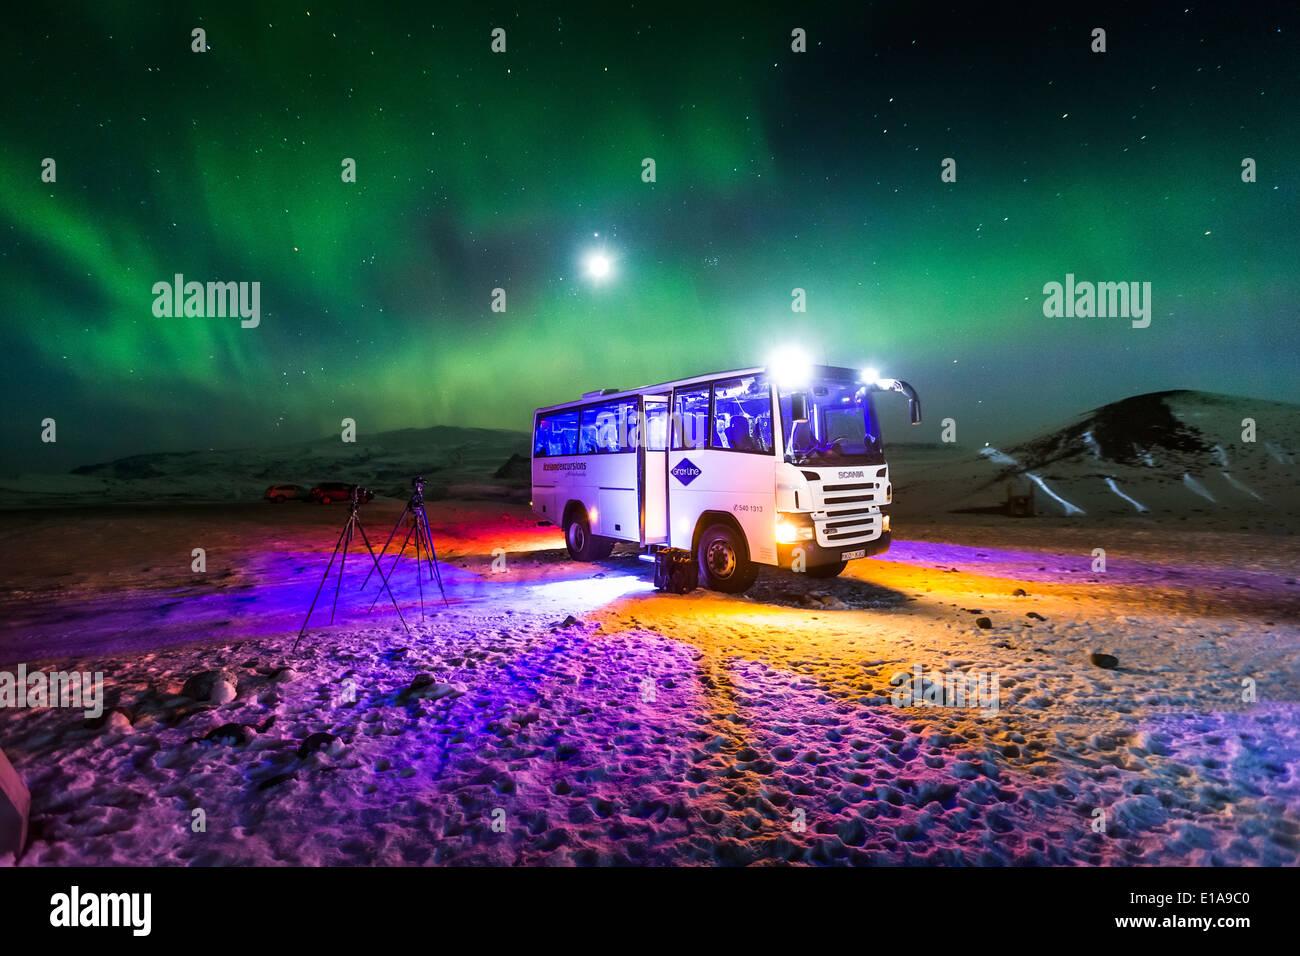 Aurora Borealis Or Northern Lights, Iceland Tour Bus At The Jokulsarlon,  Breidamerkurjokull, Vatnajokull Ice Cap, Iceland